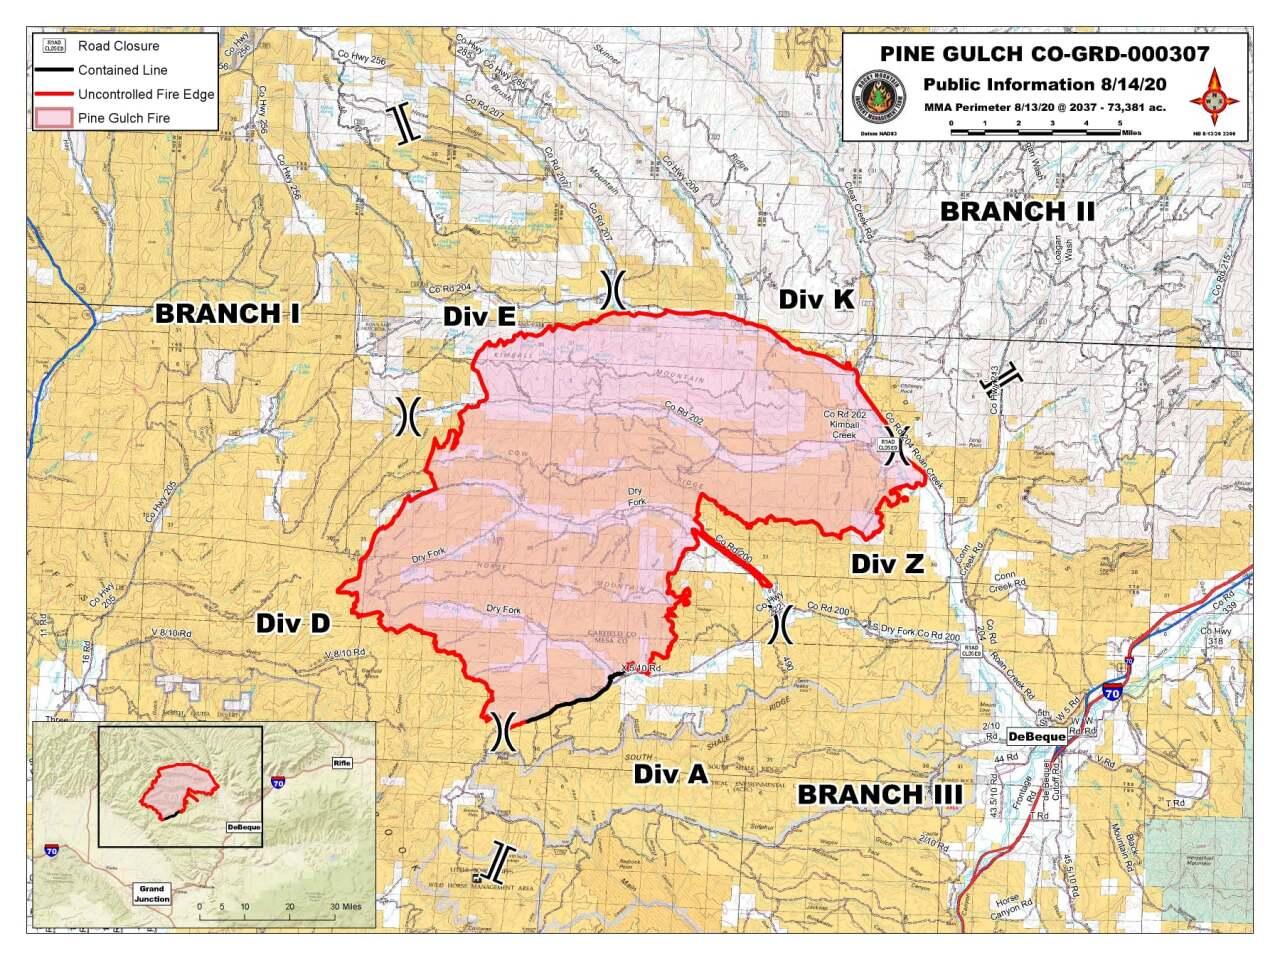 Pine Gulch Fire map_Aug 13 2020 8:37pm